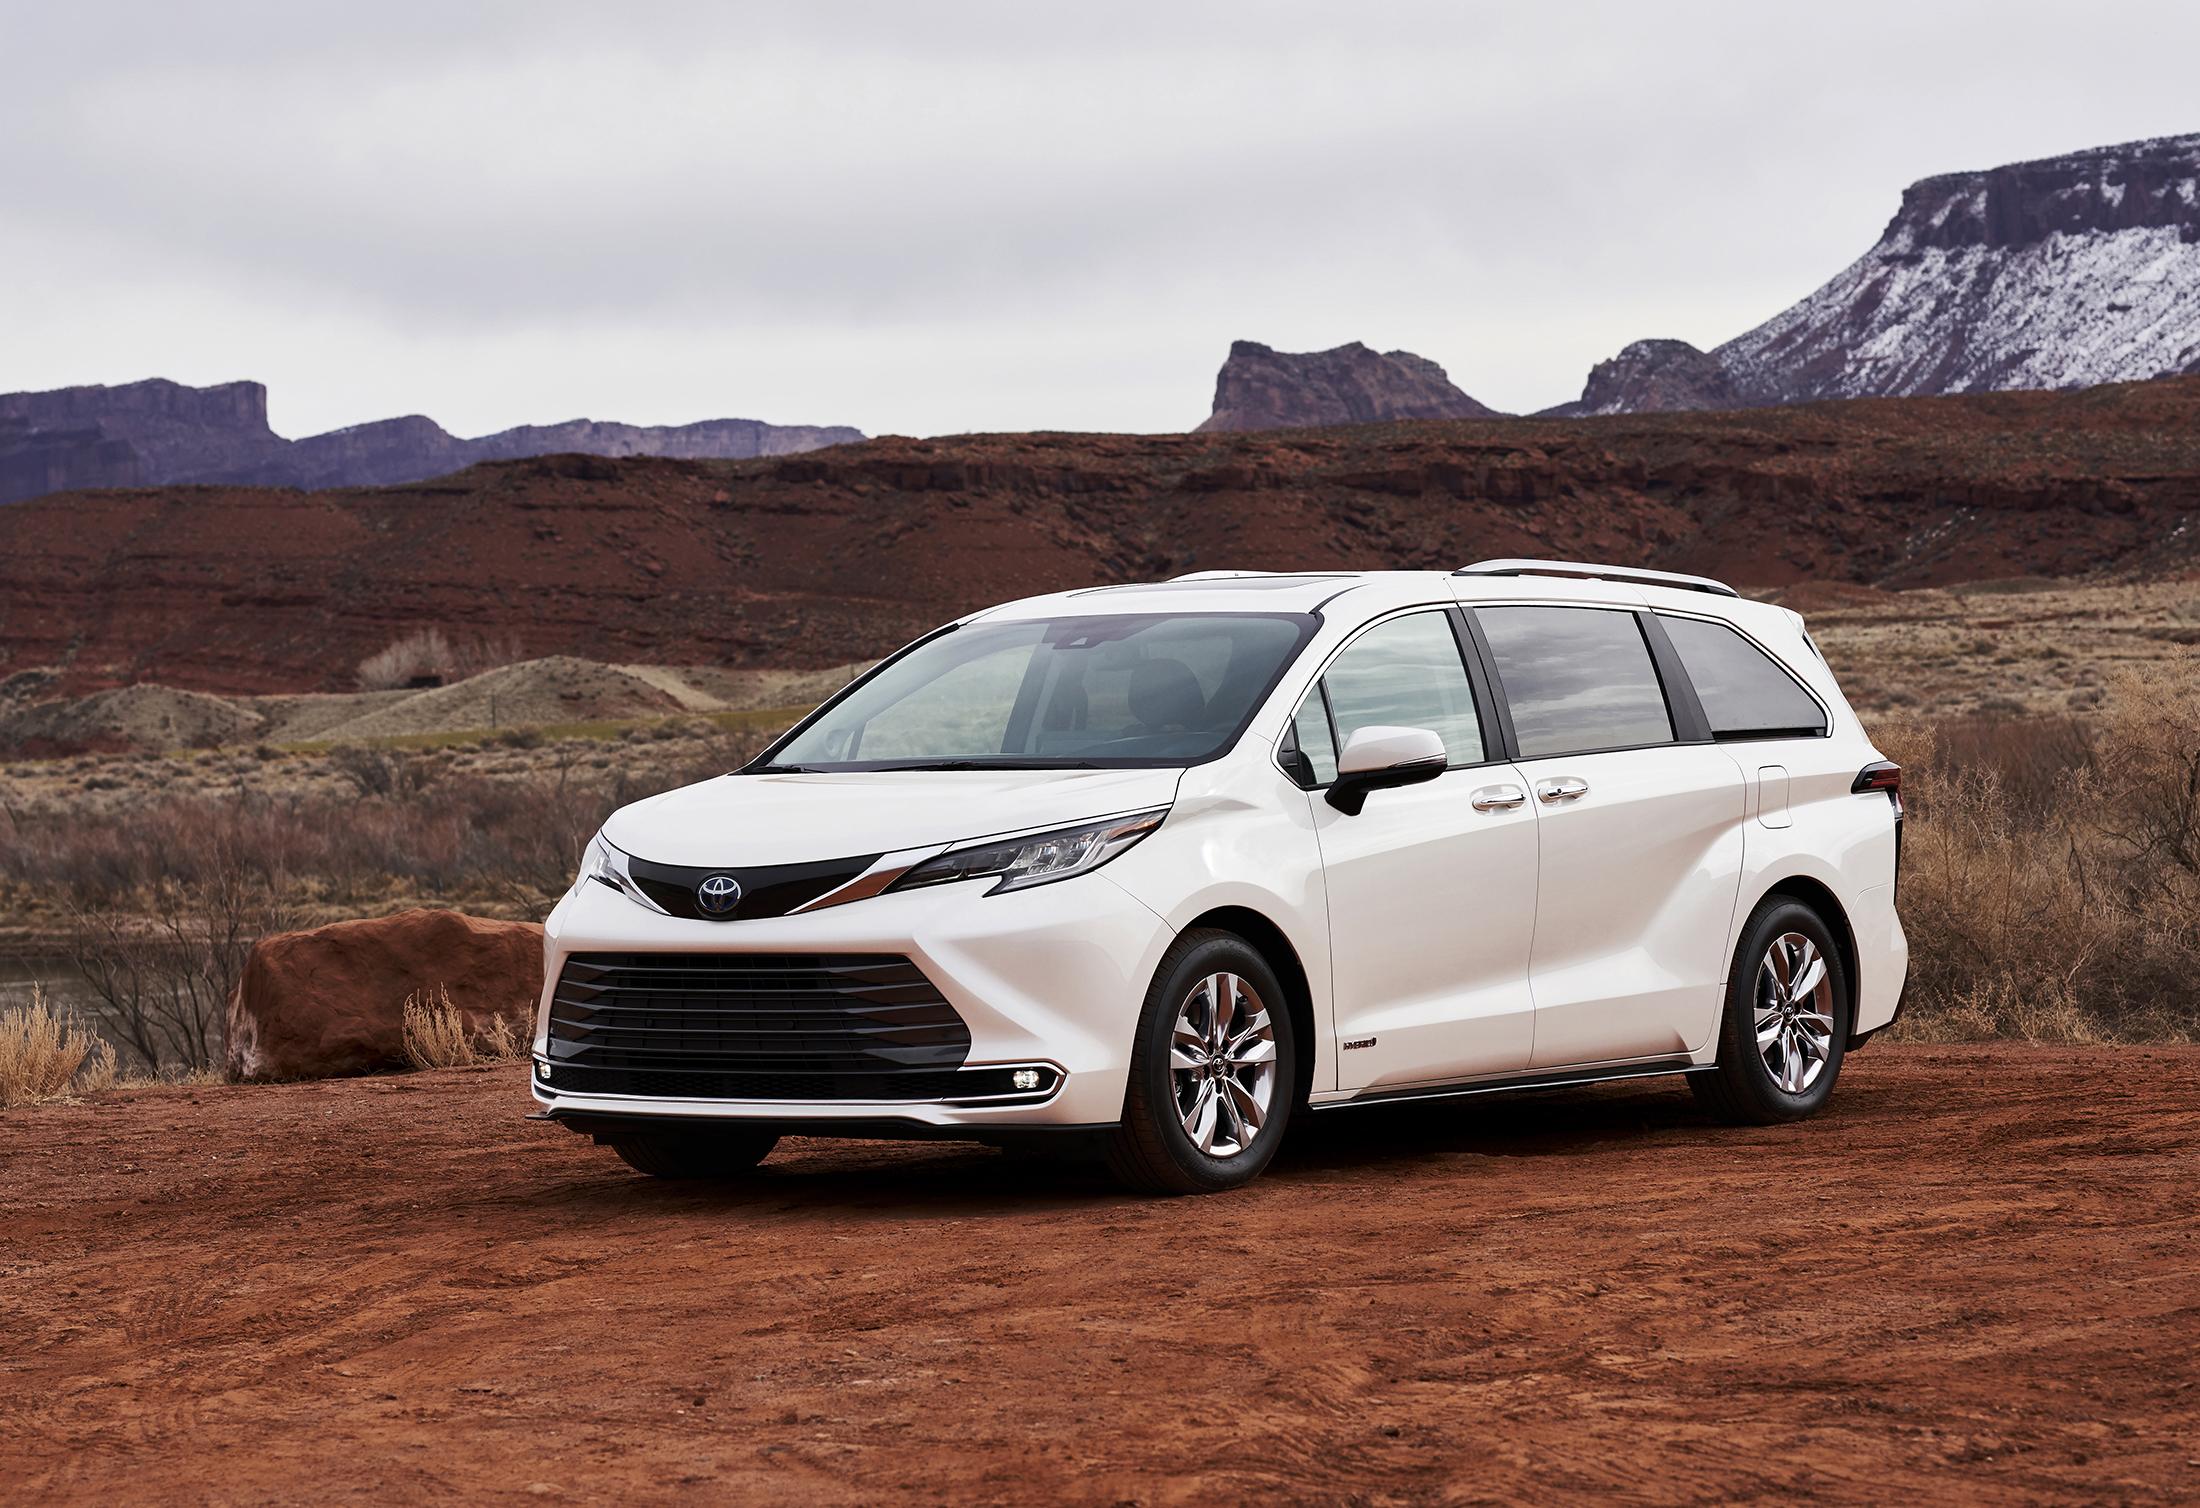 2021 Toyota Sienna Powers Families With New Hybrid Drivetrain